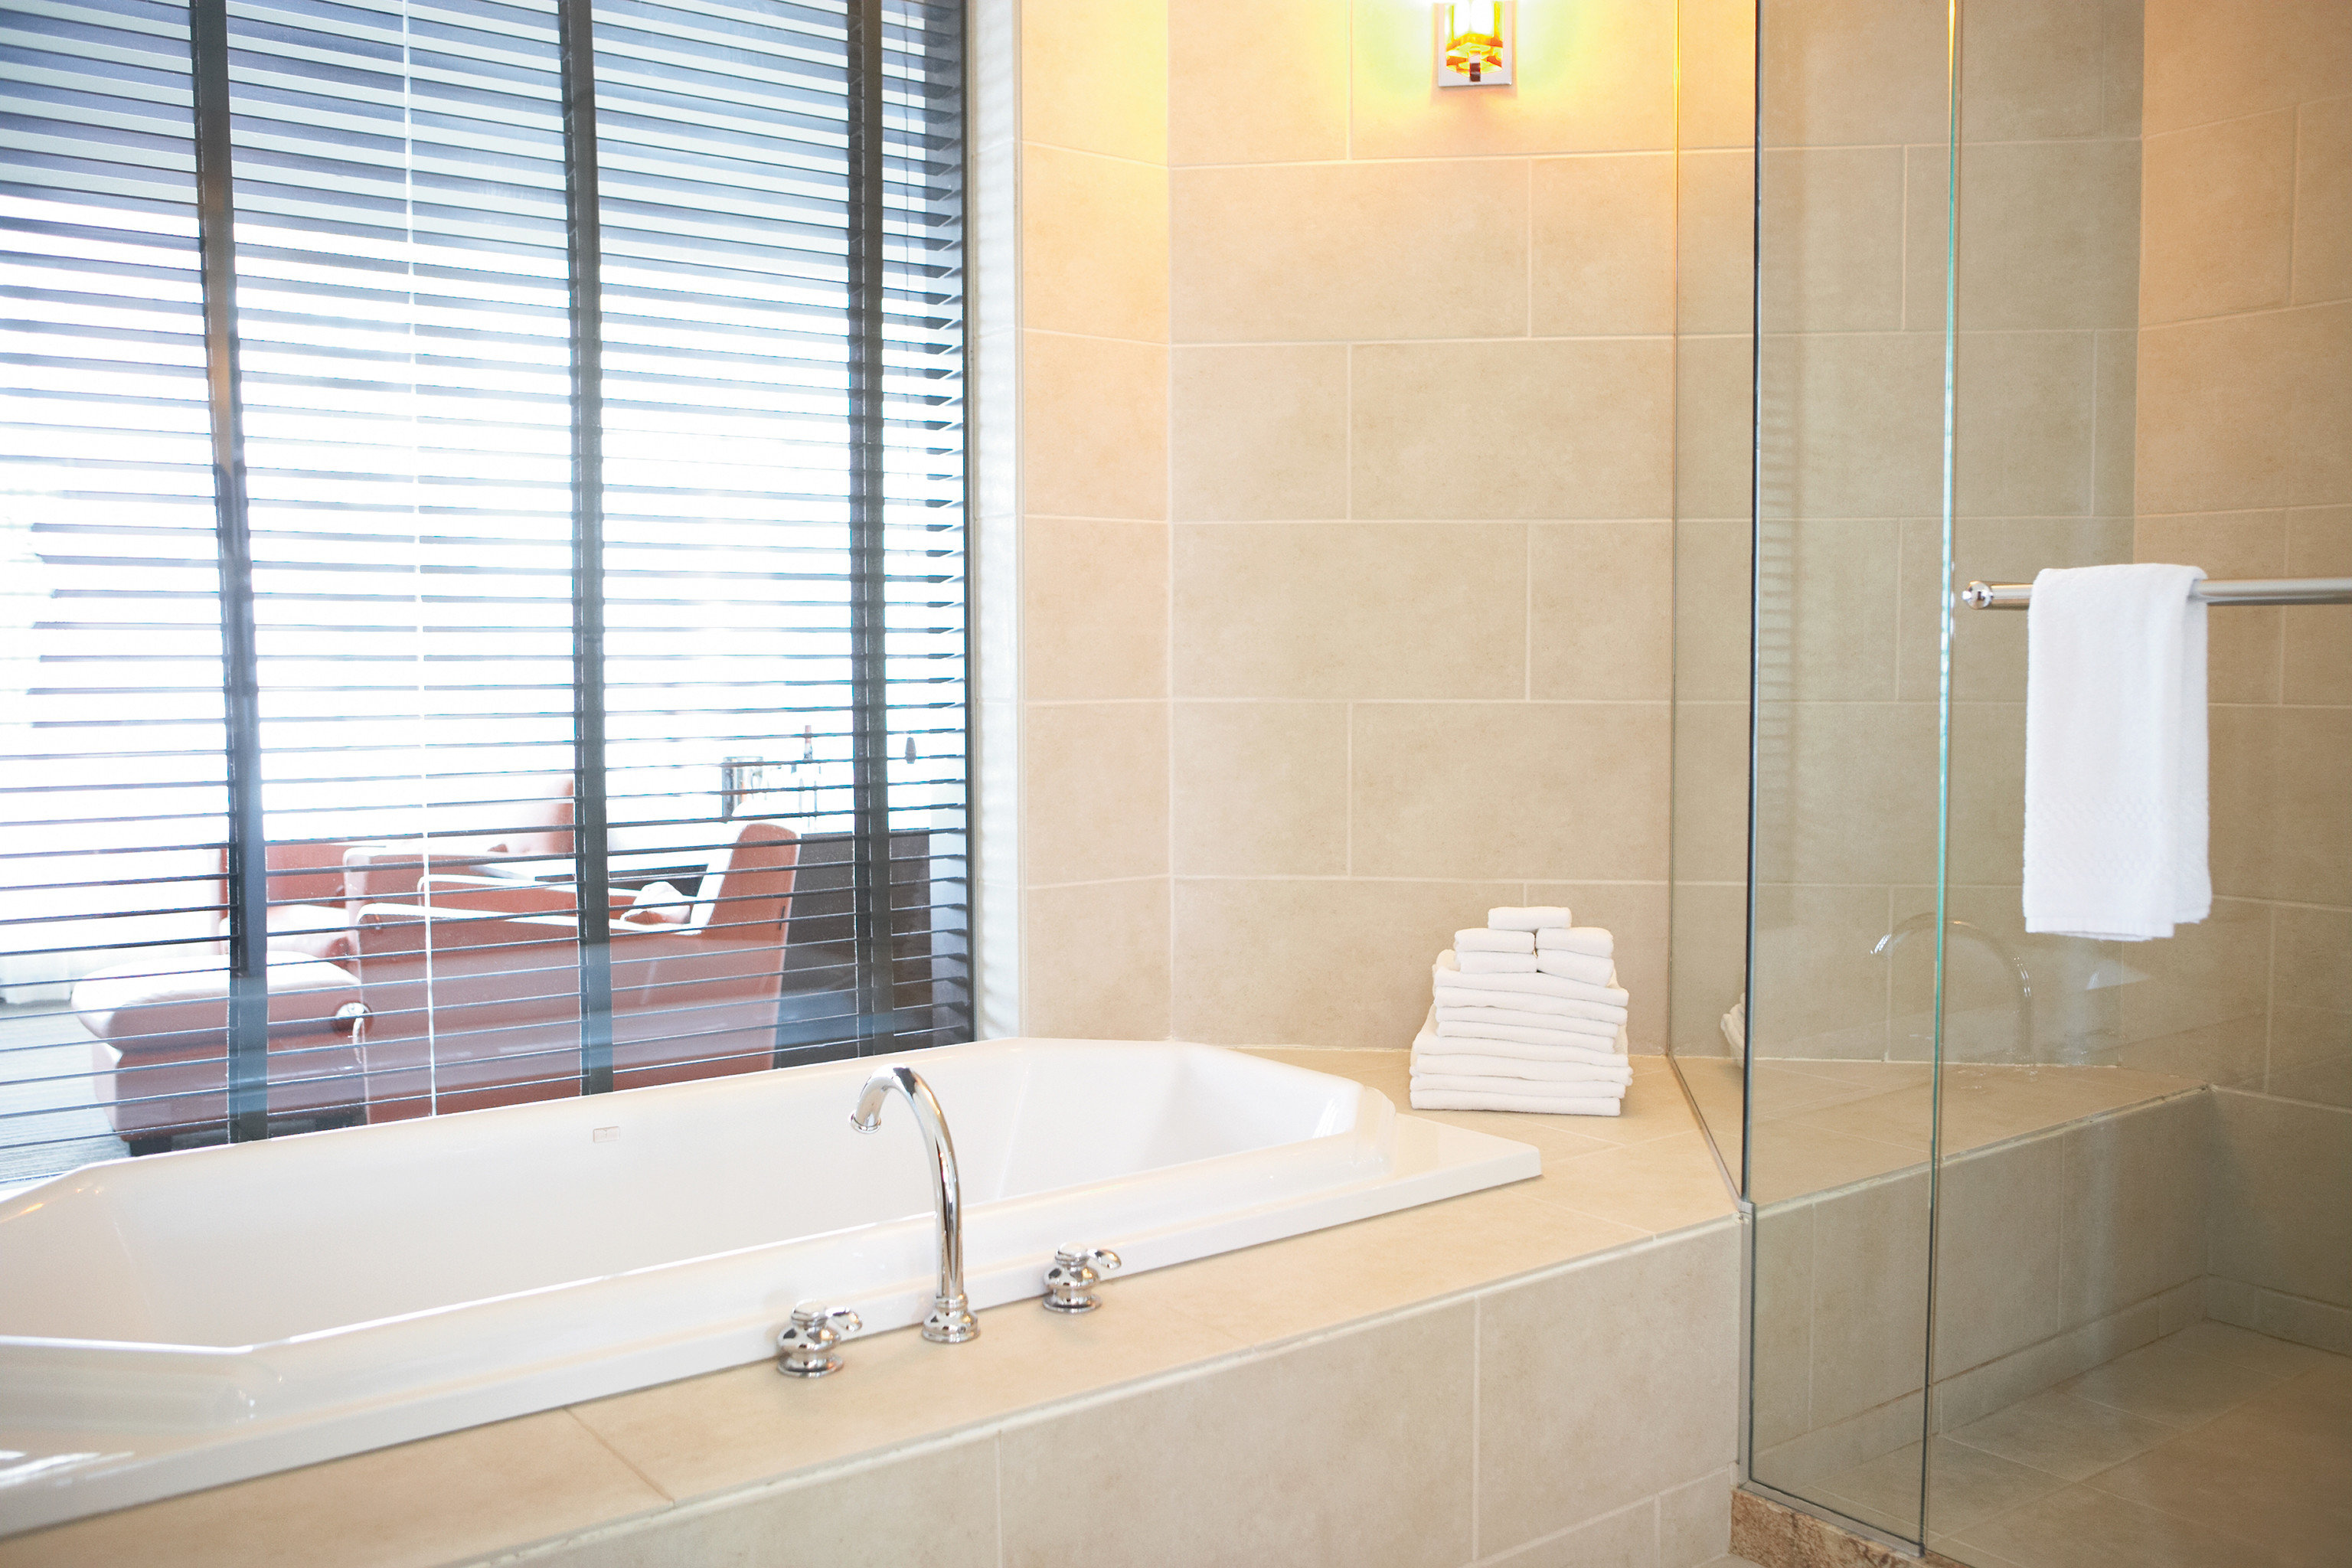 Bath Boutique Modern bathroom sink bathtub plumbing fixture toilet vessel tile flooring tiled tub tan